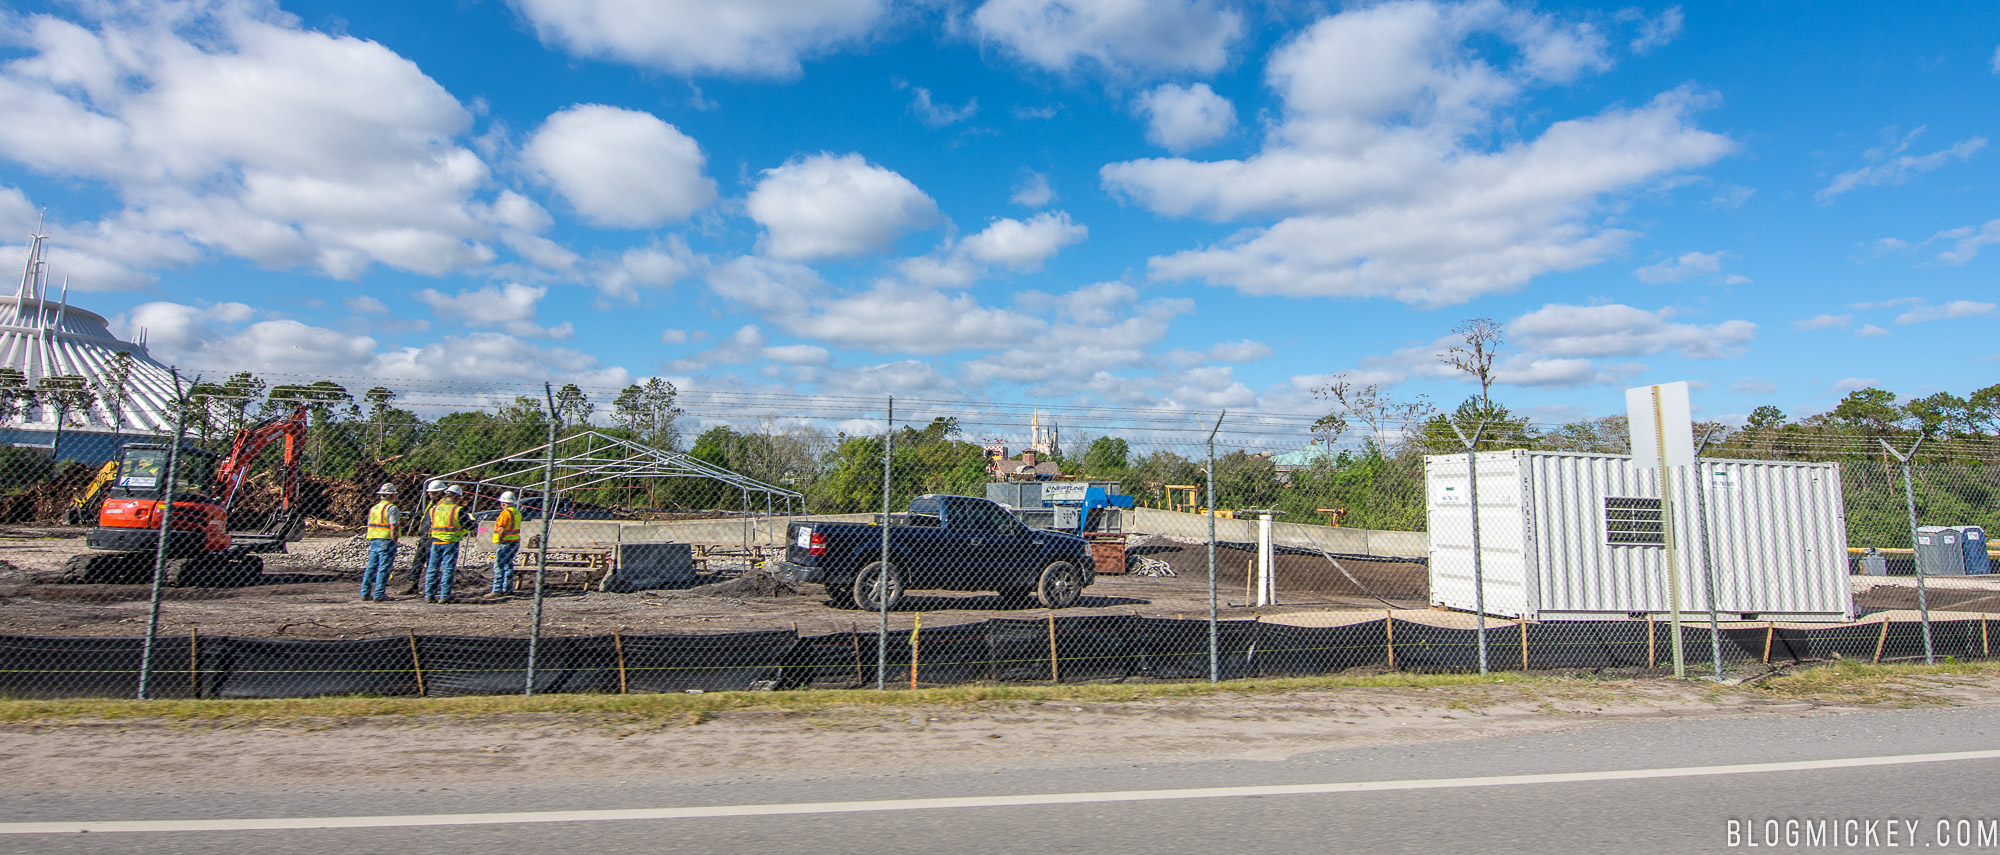 Tron Roller Coaster Construction in Magic Kingdom